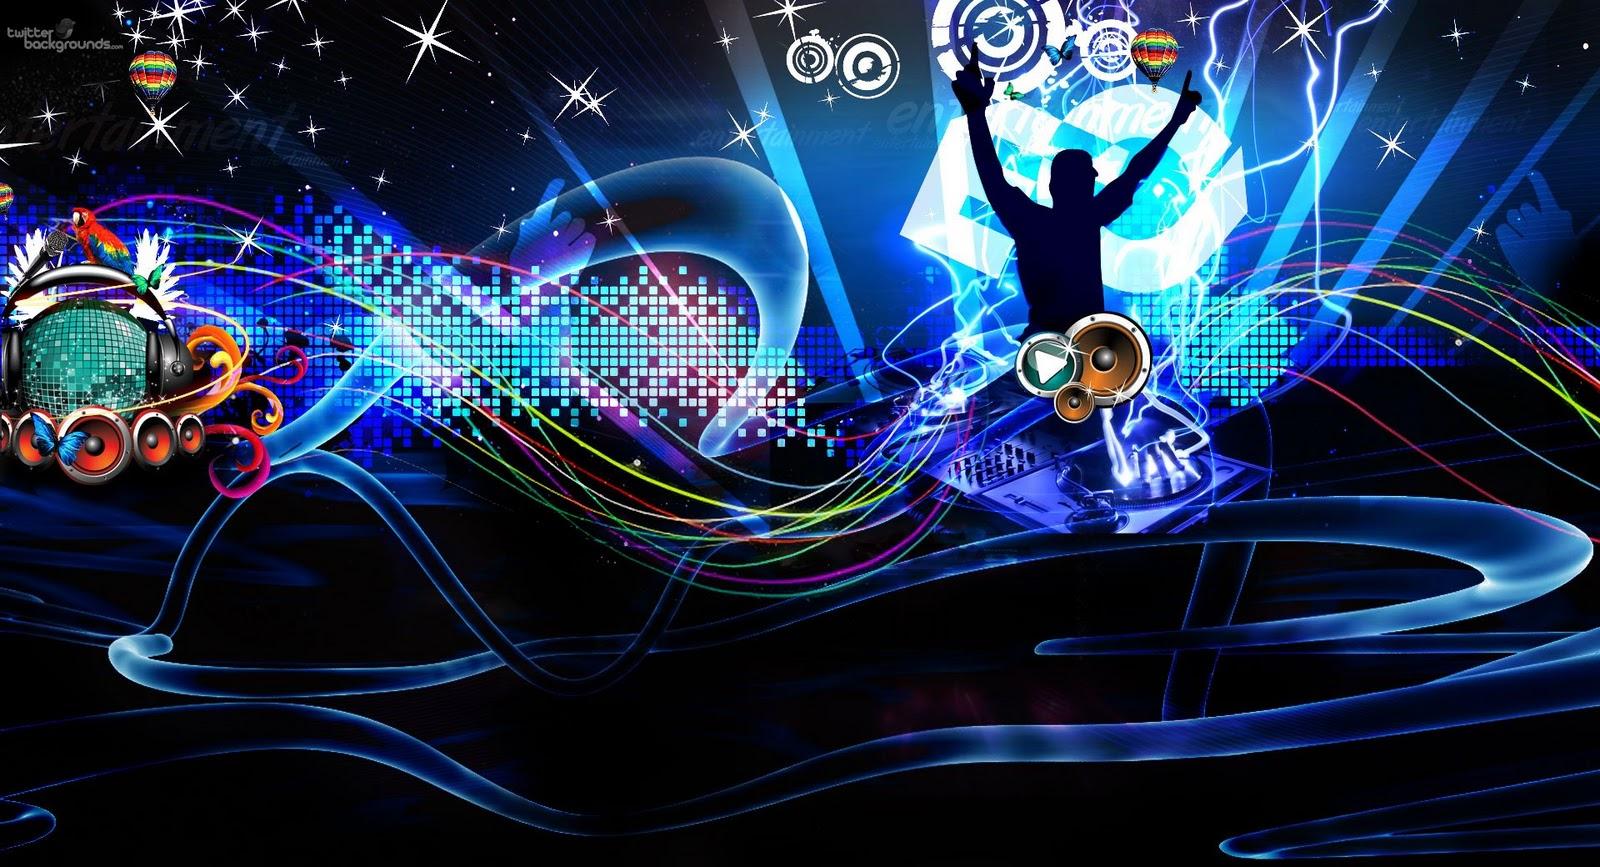 music-1_br1.jpg